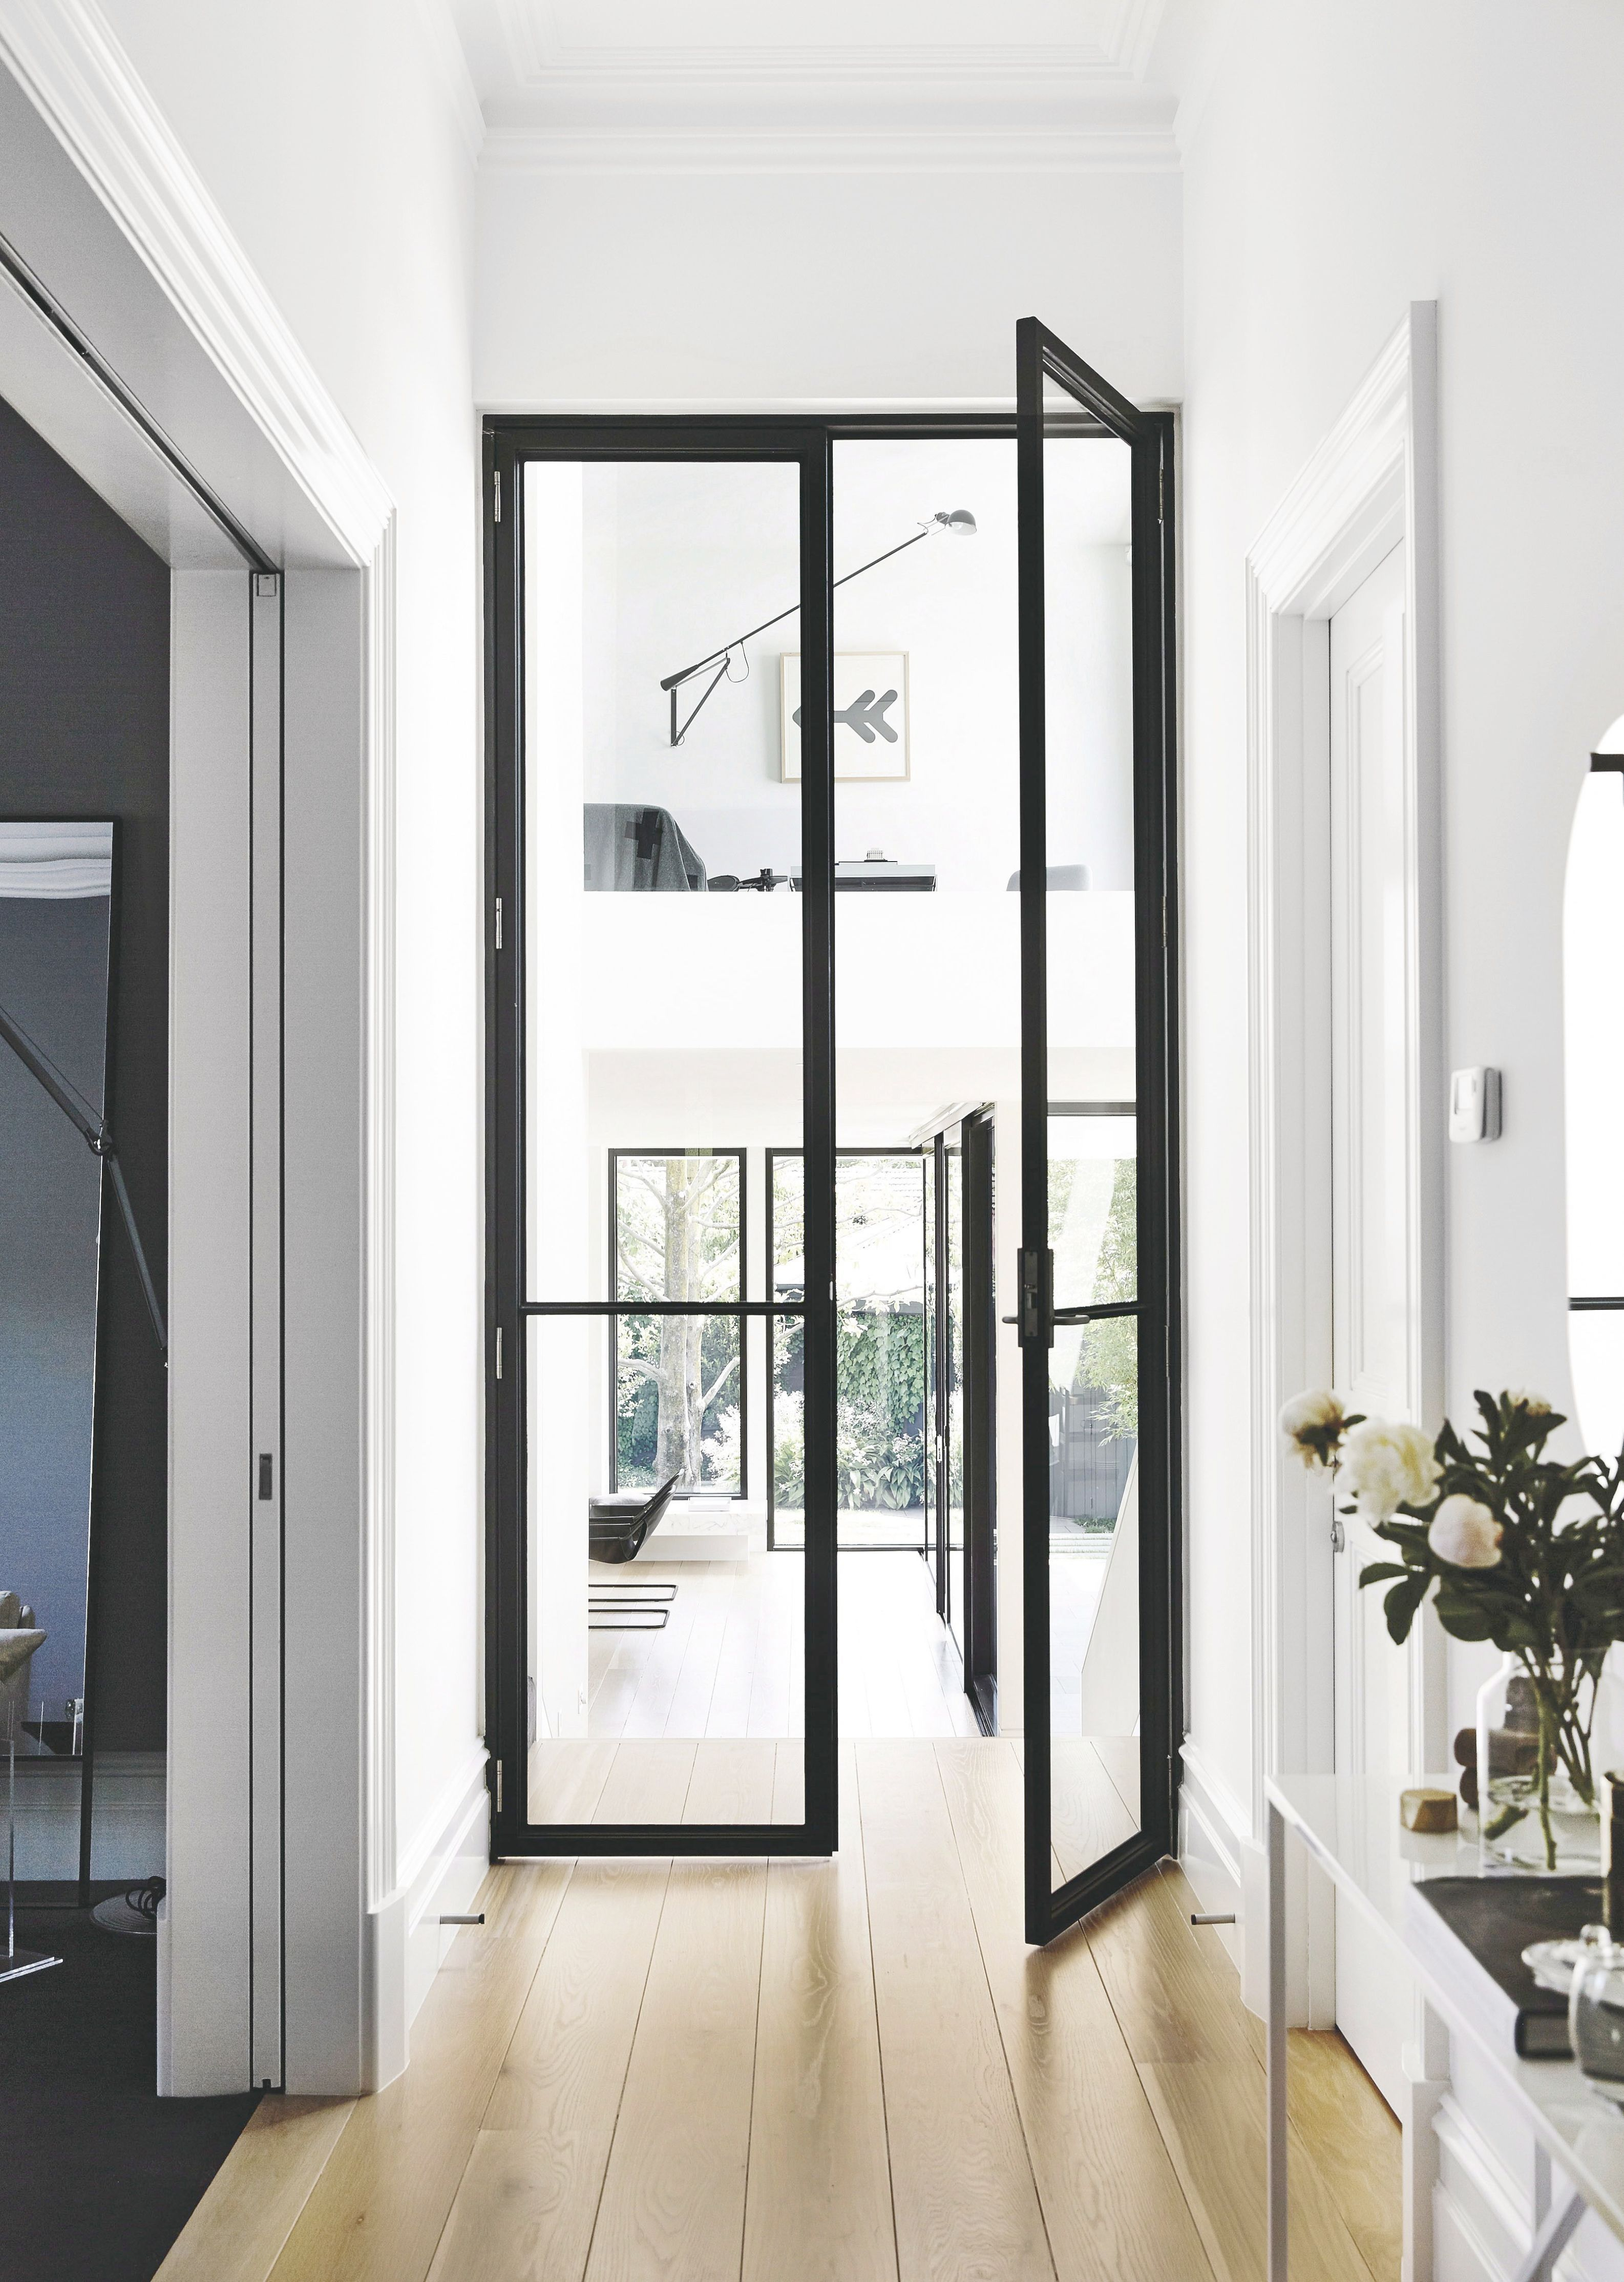 Breathtaking   home interior design job outlook xo also rh pinterest